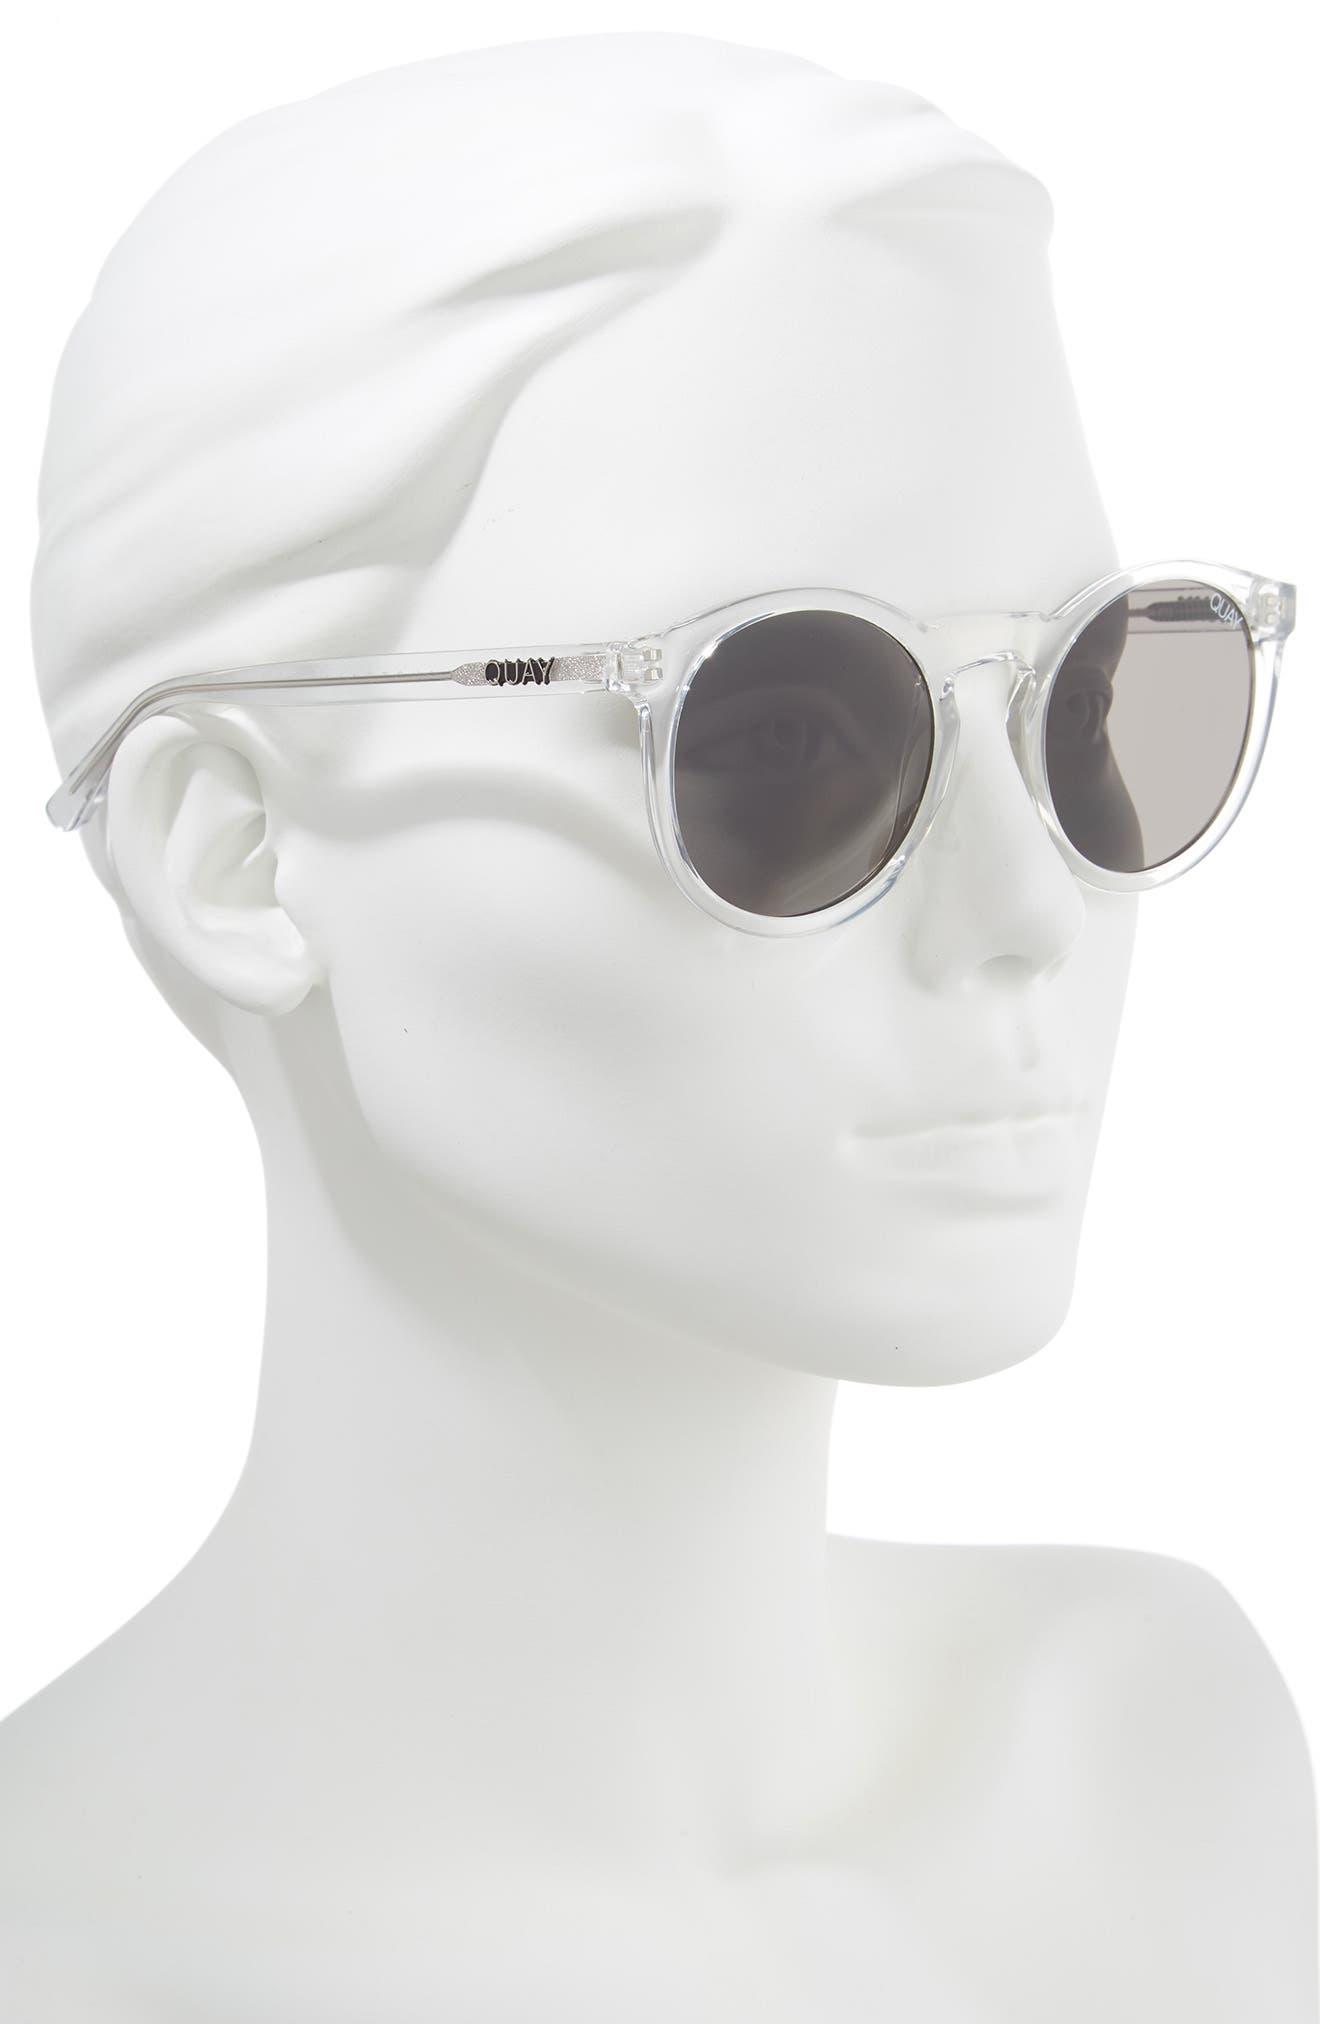 Kosha 49mm Round Sunglasses,                             Alternate thumbnail 3, color,                             Clear/ Smoke